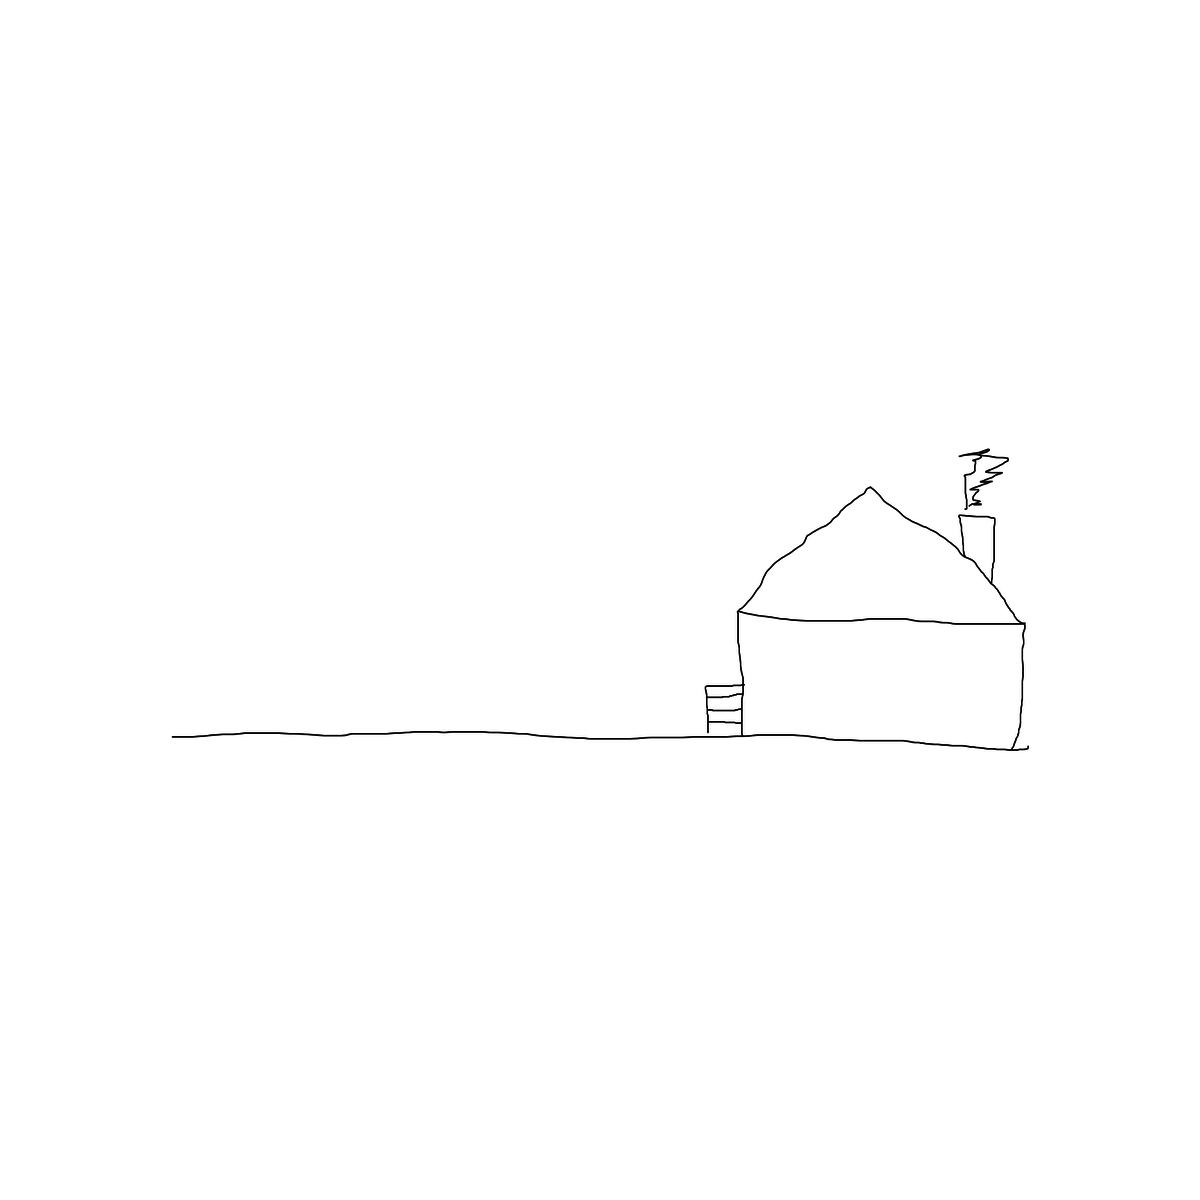 BAAAM drawing#1748 lat:46.3245429992675800lng: -79.4821472167968800